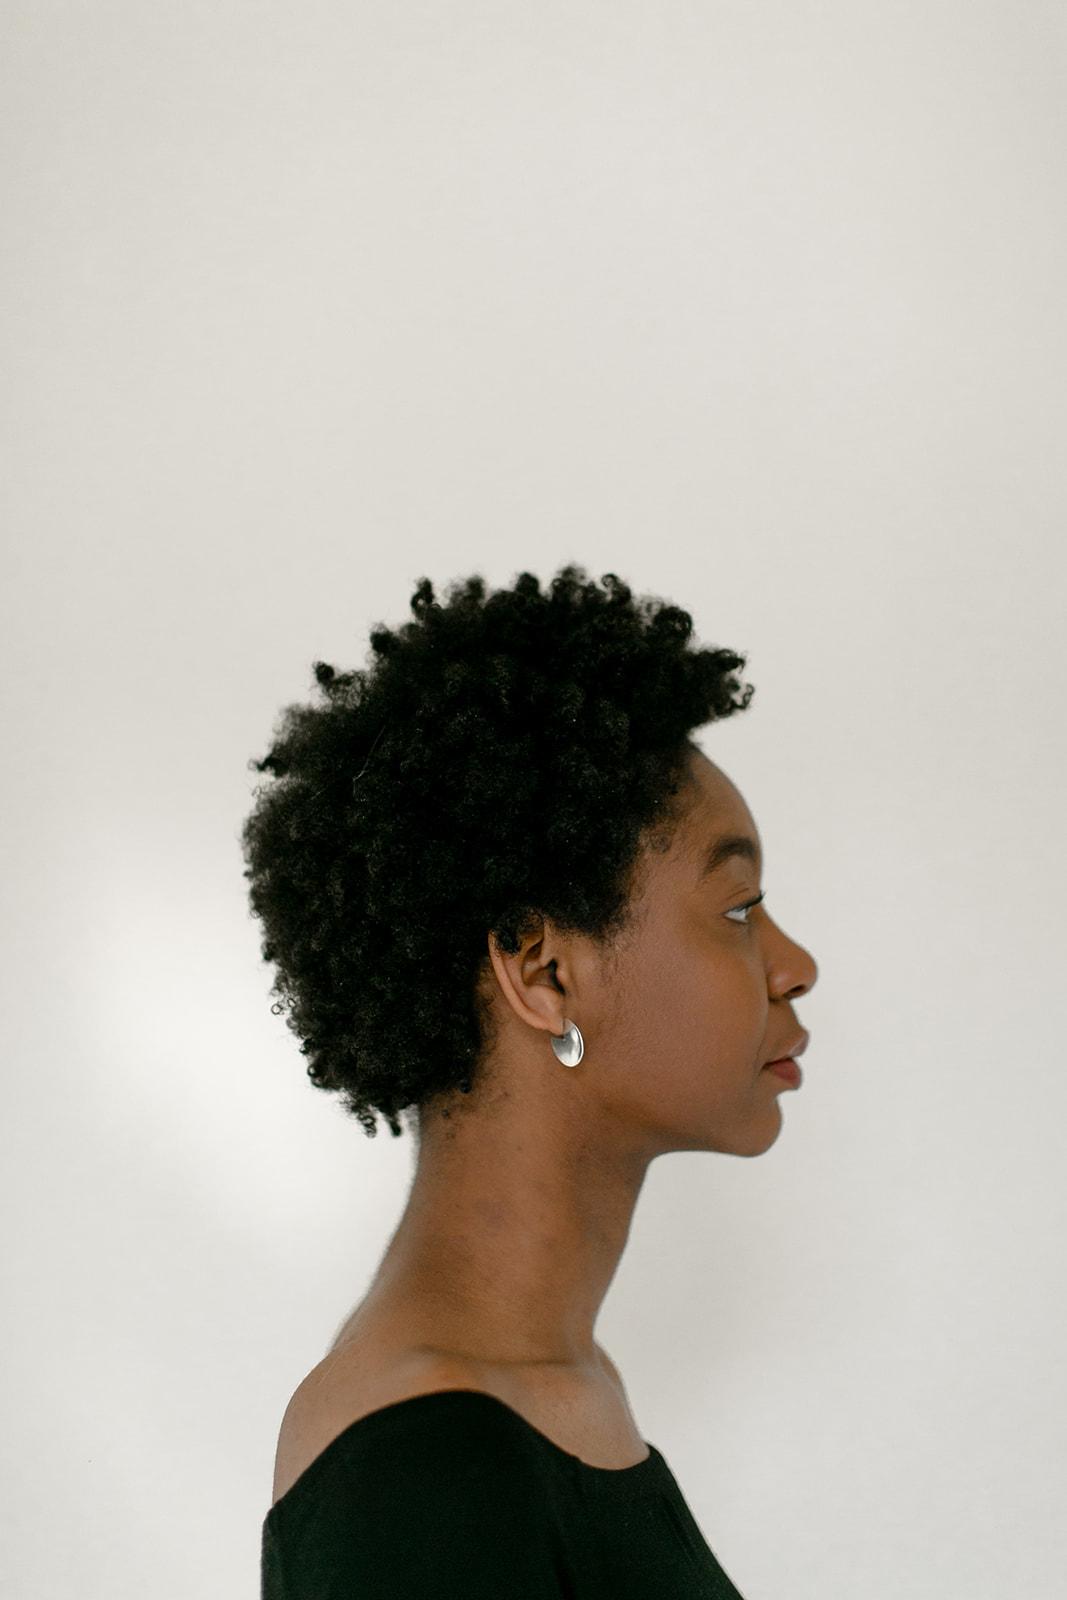 Earrings by Savannah jewelry designer, Tatiana Cabral Smith | photo by  Melody Joy Co